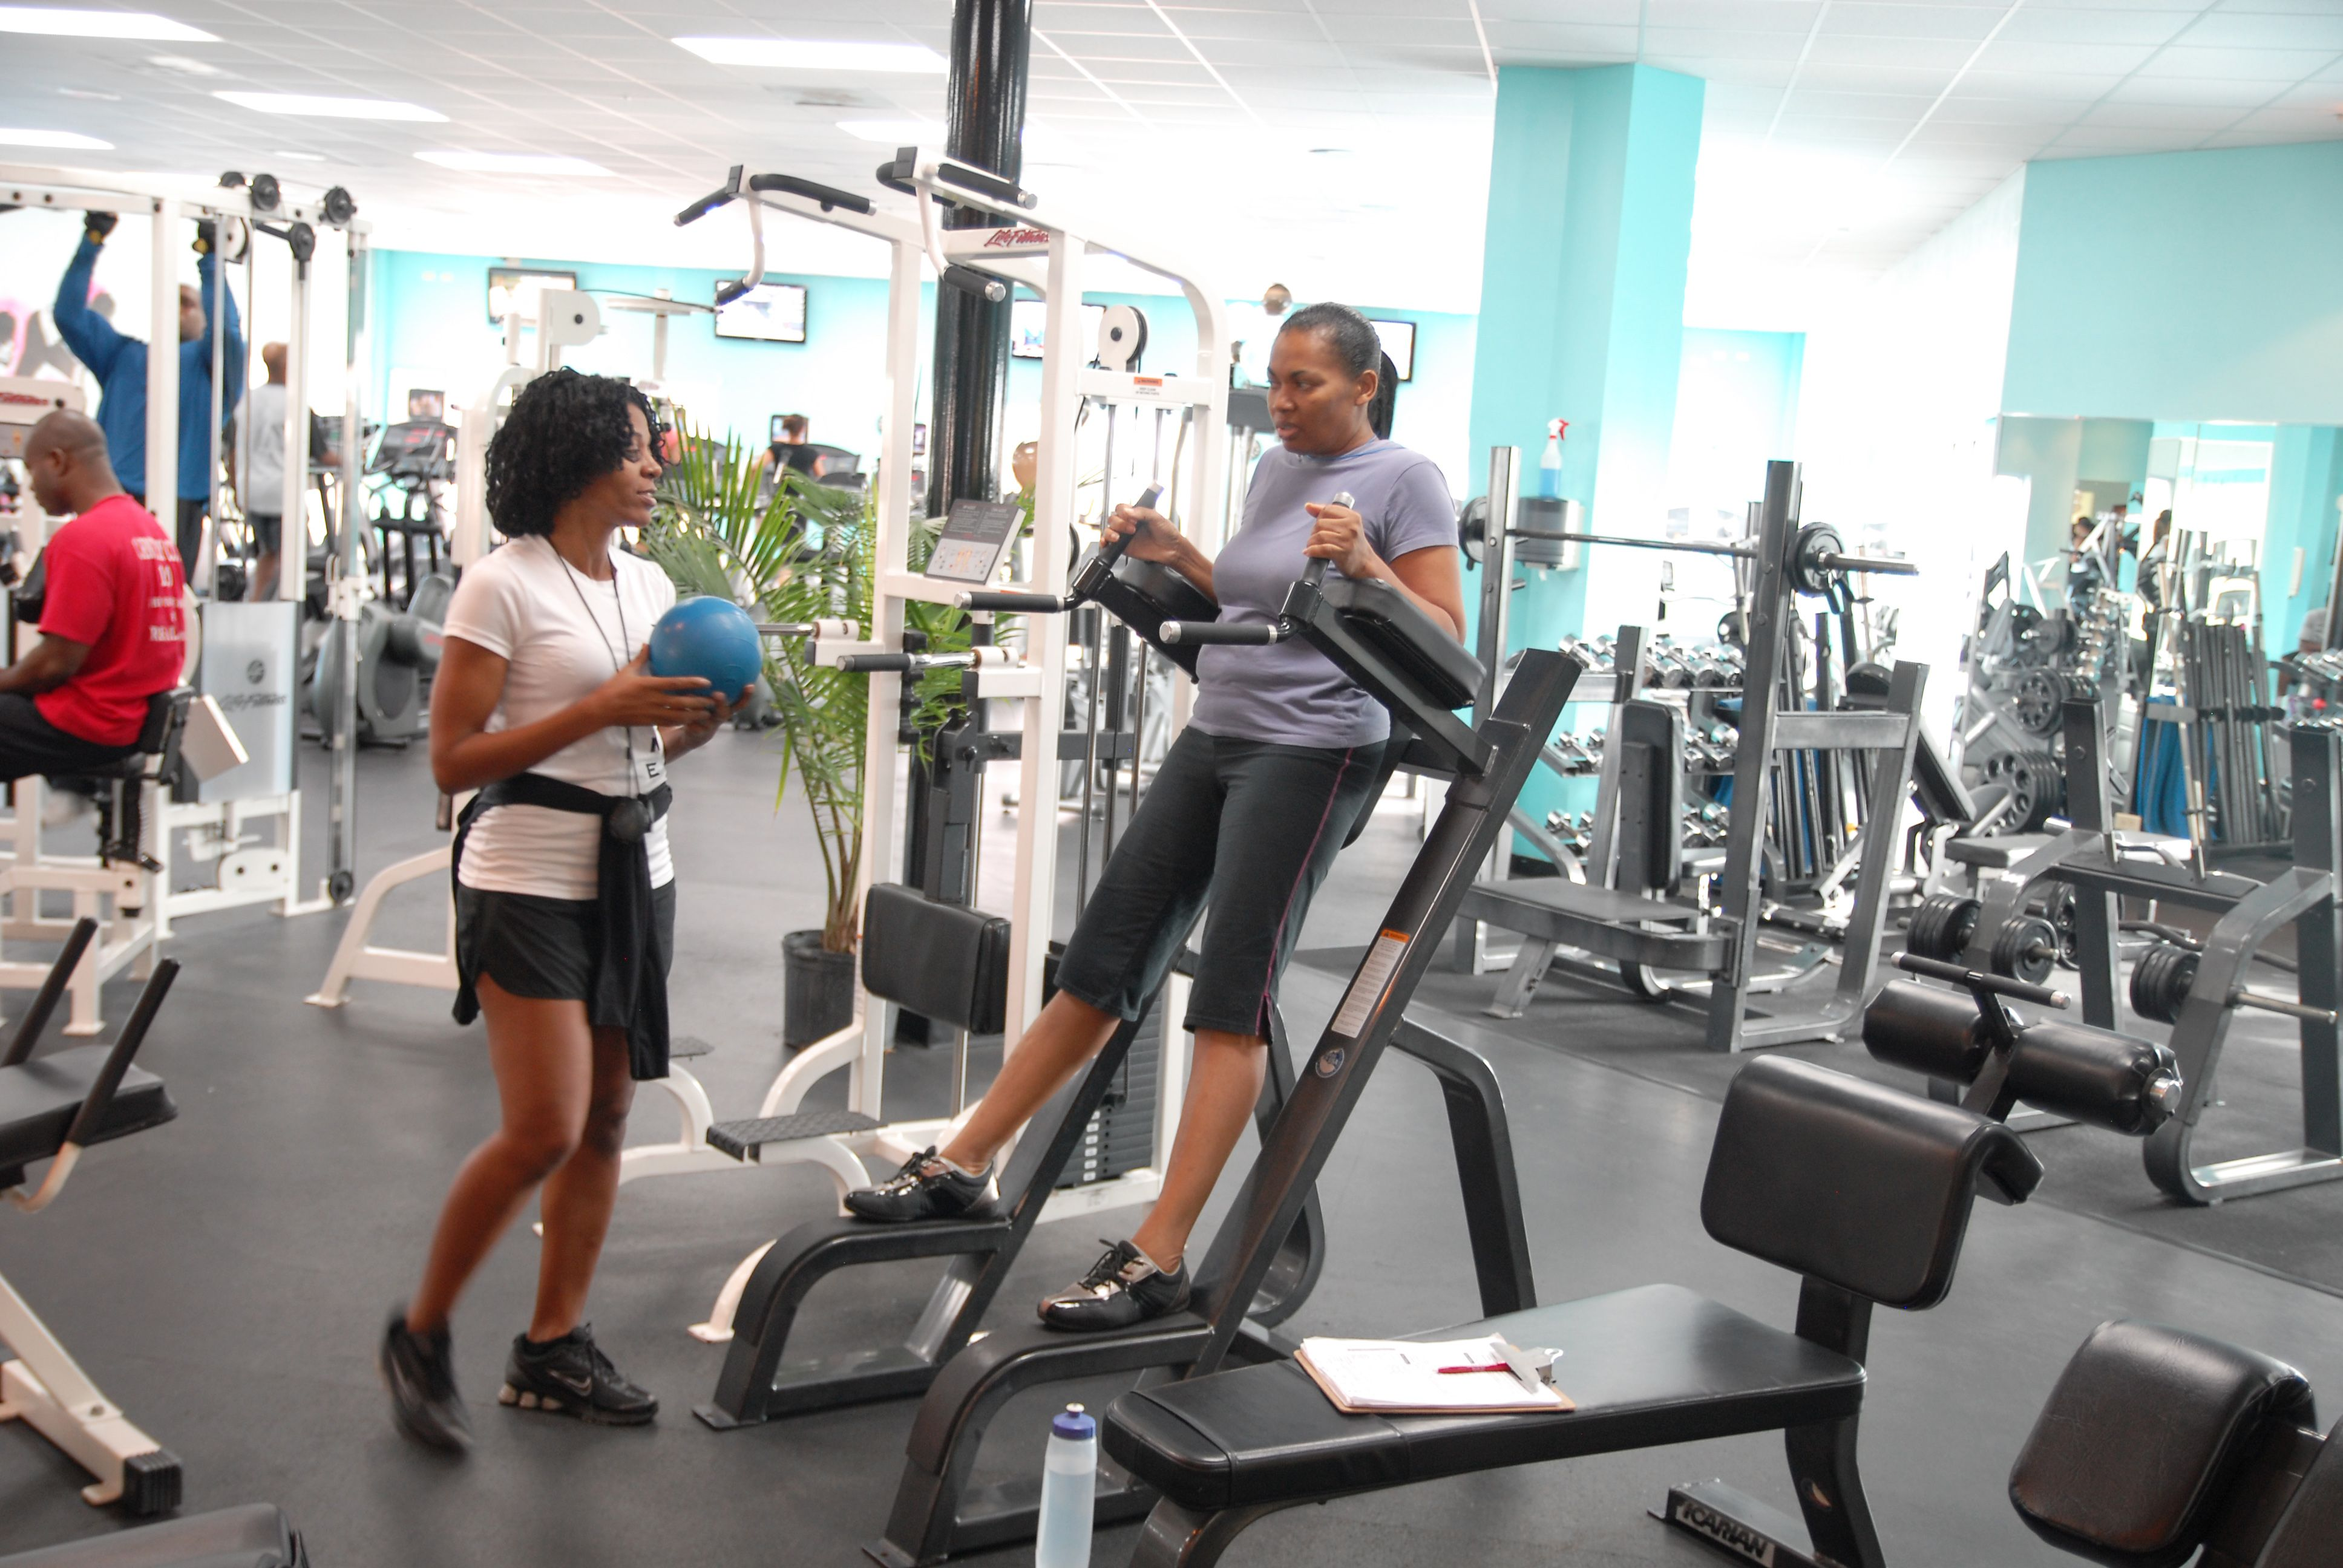 Personaltraining Clubone Bahamas Personal Training Bahamas Gym